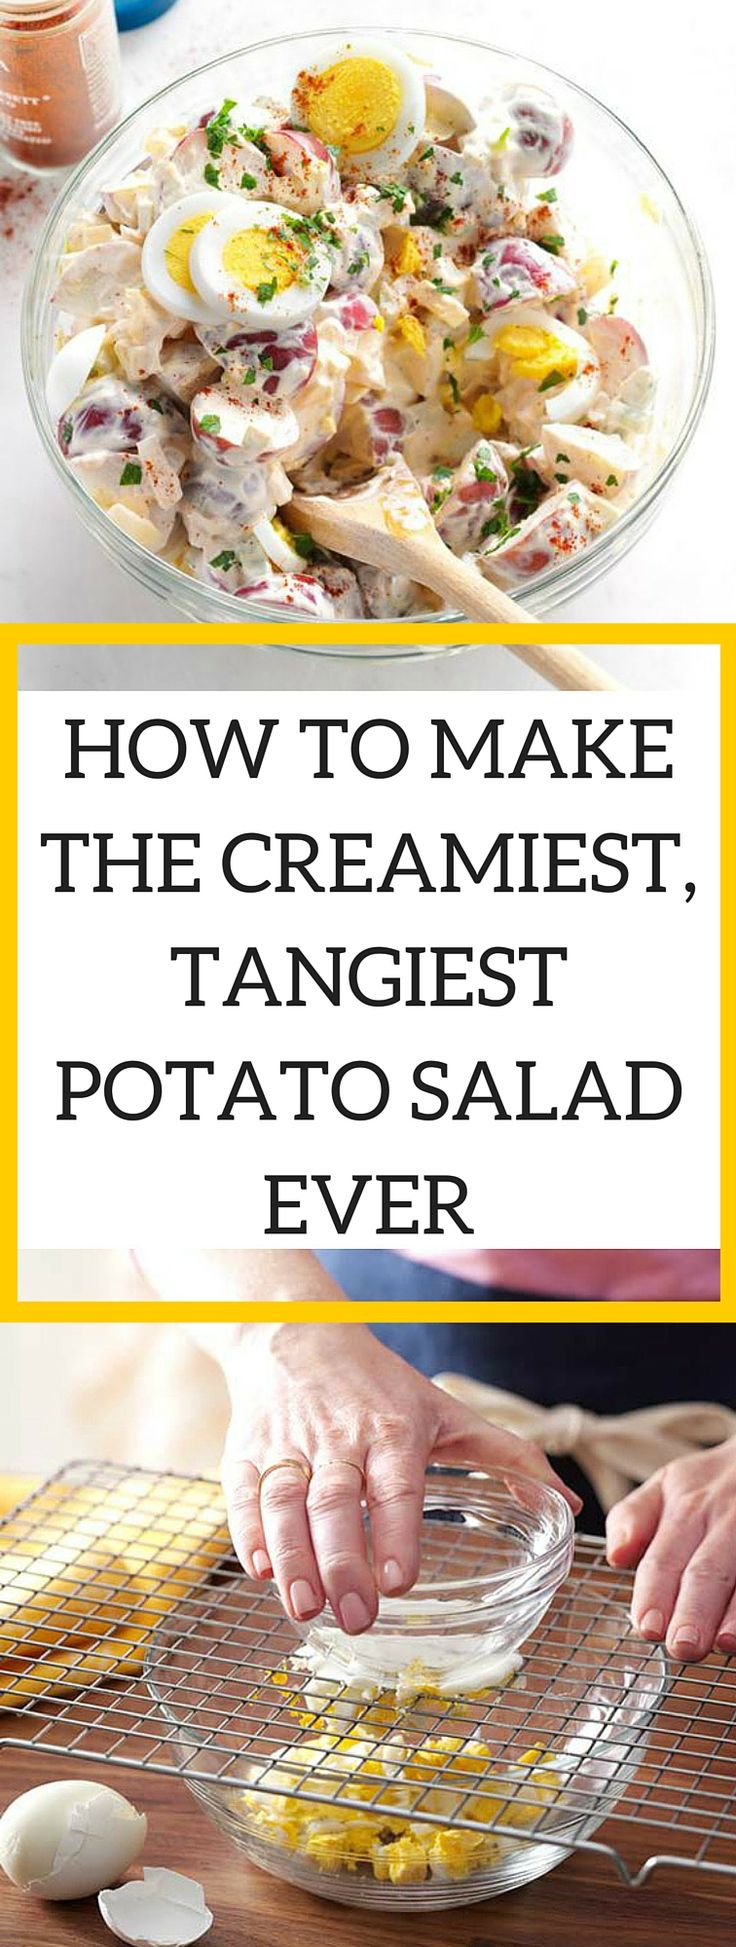 how to cook potato salad